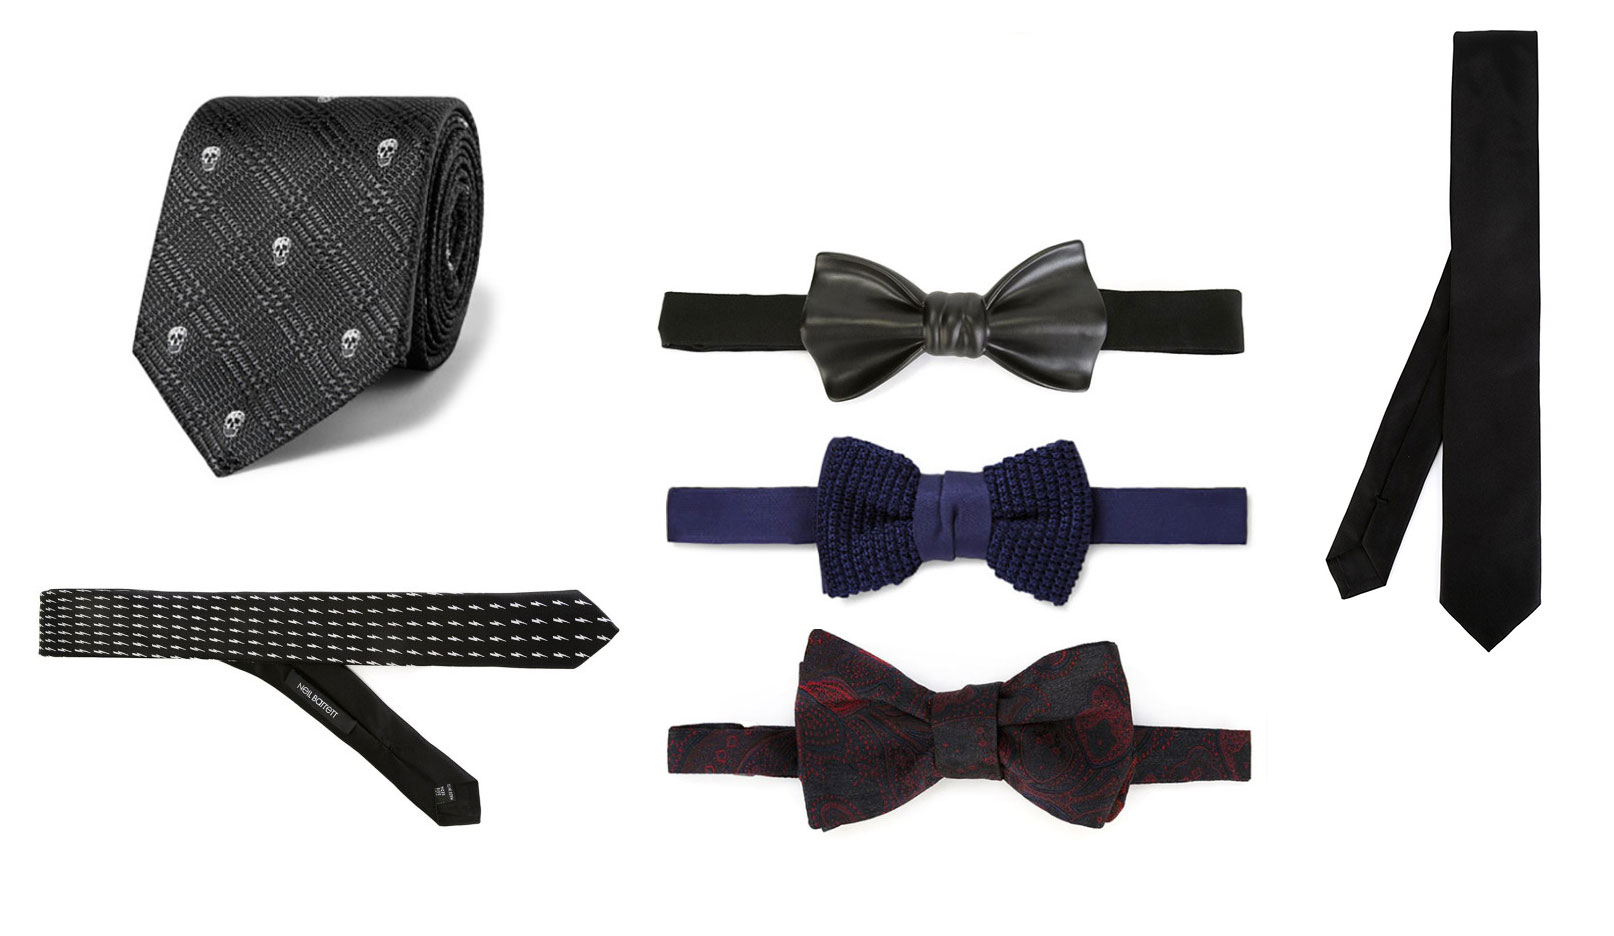 Cravatta o papillon?